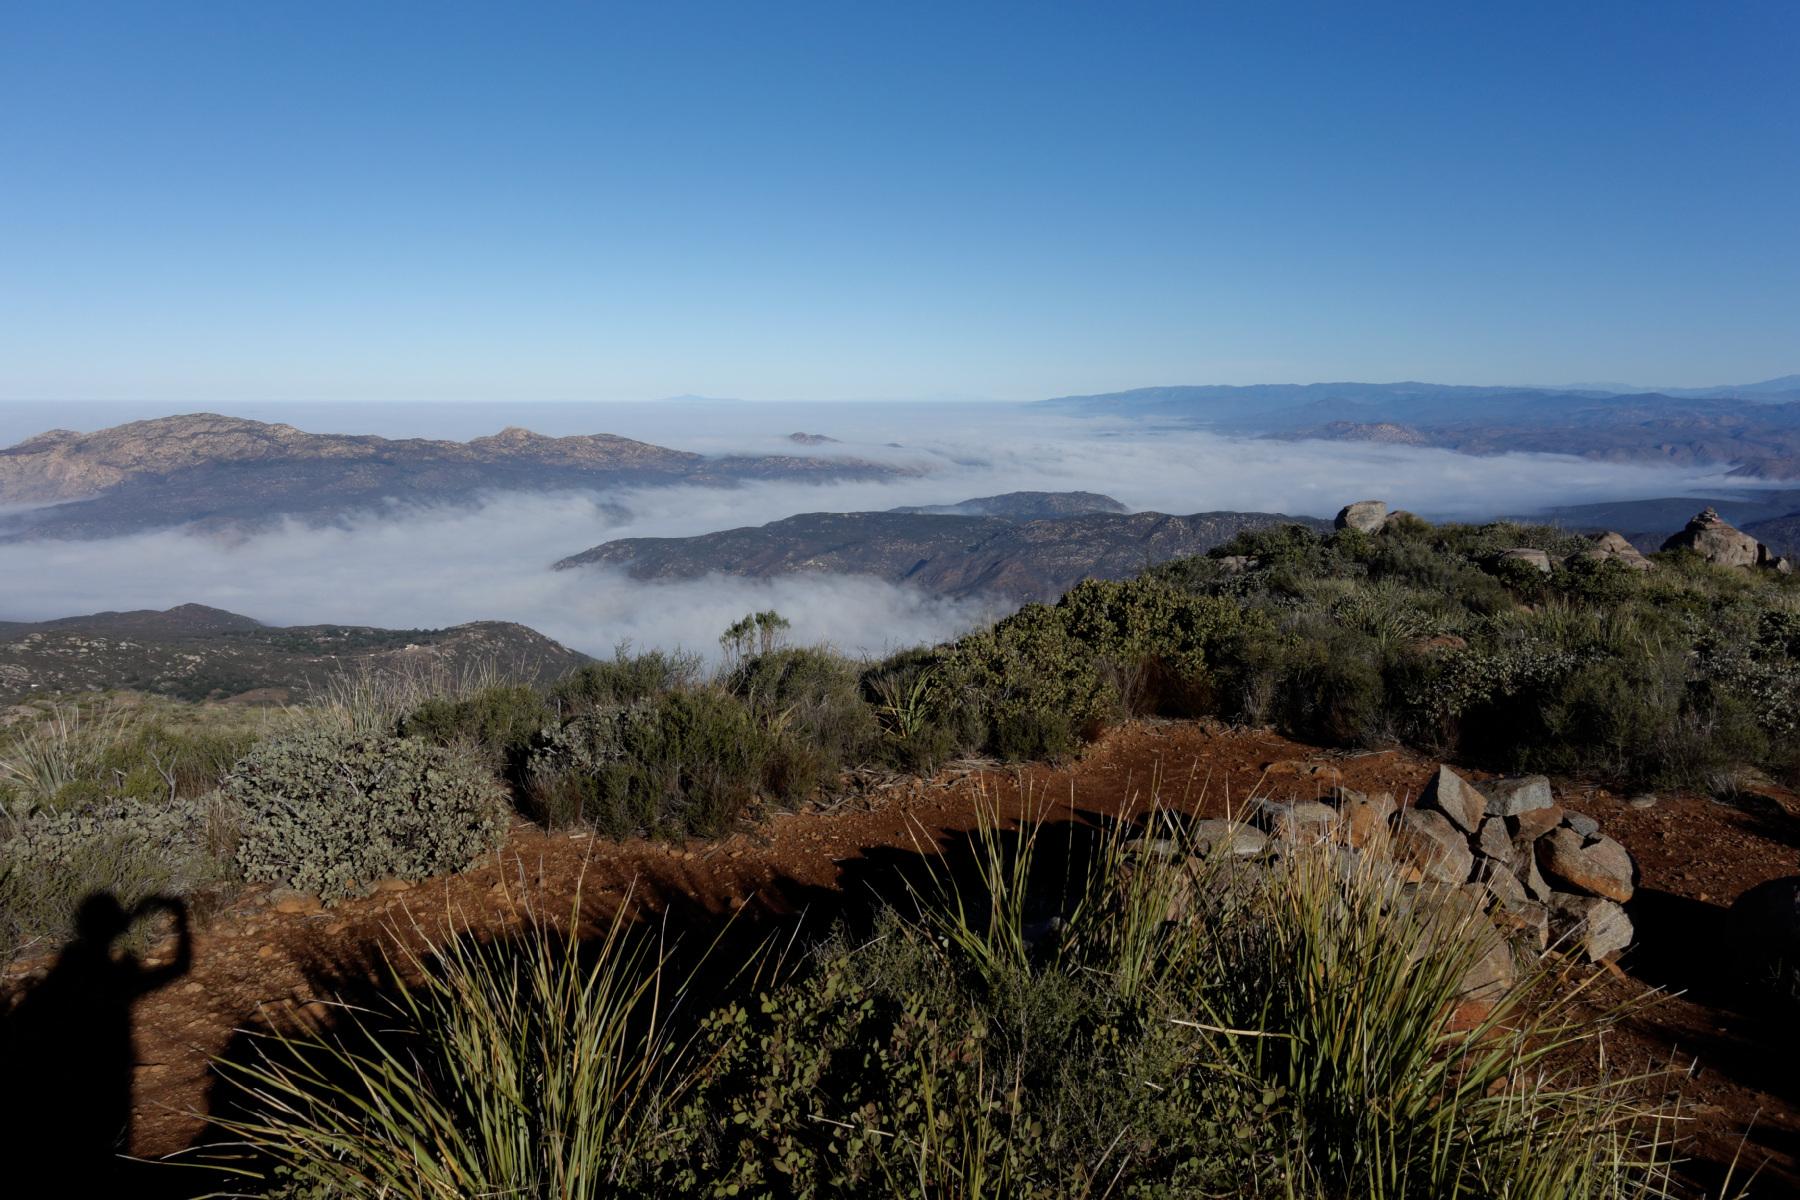 Viejas Mountain – Photo Gallery